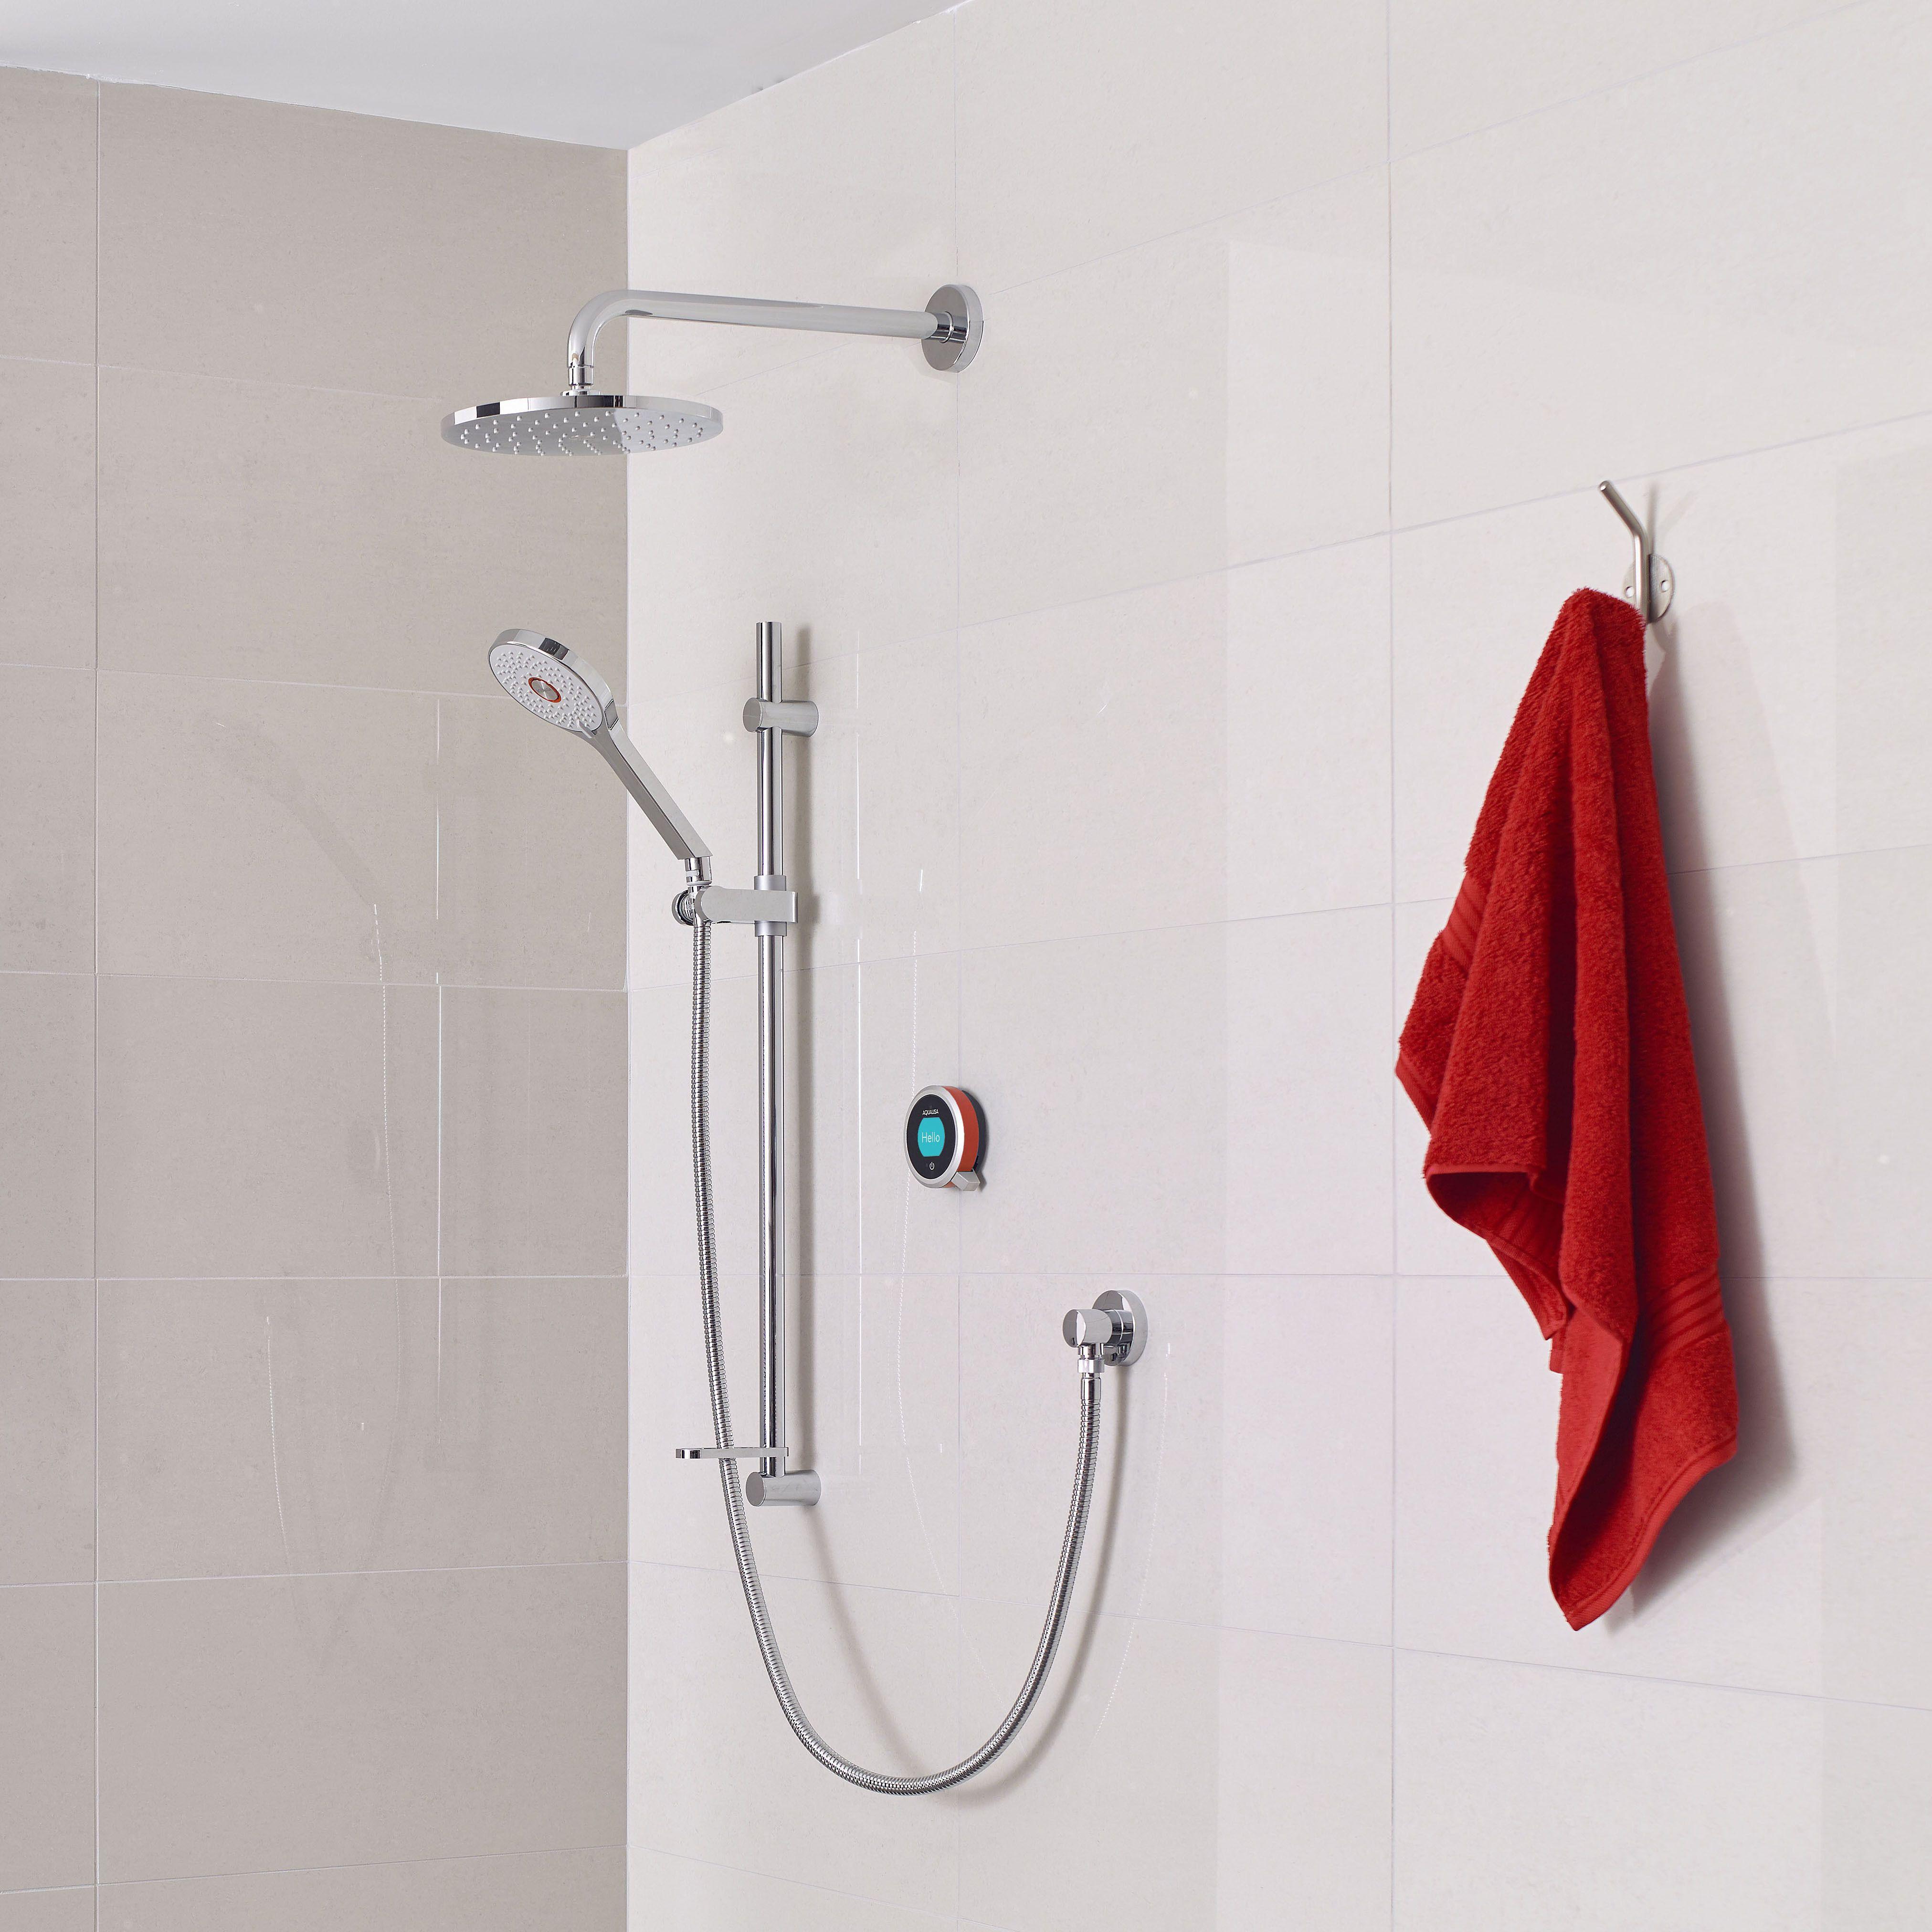 Aqualisa q thermostatic shower concealed adjustable